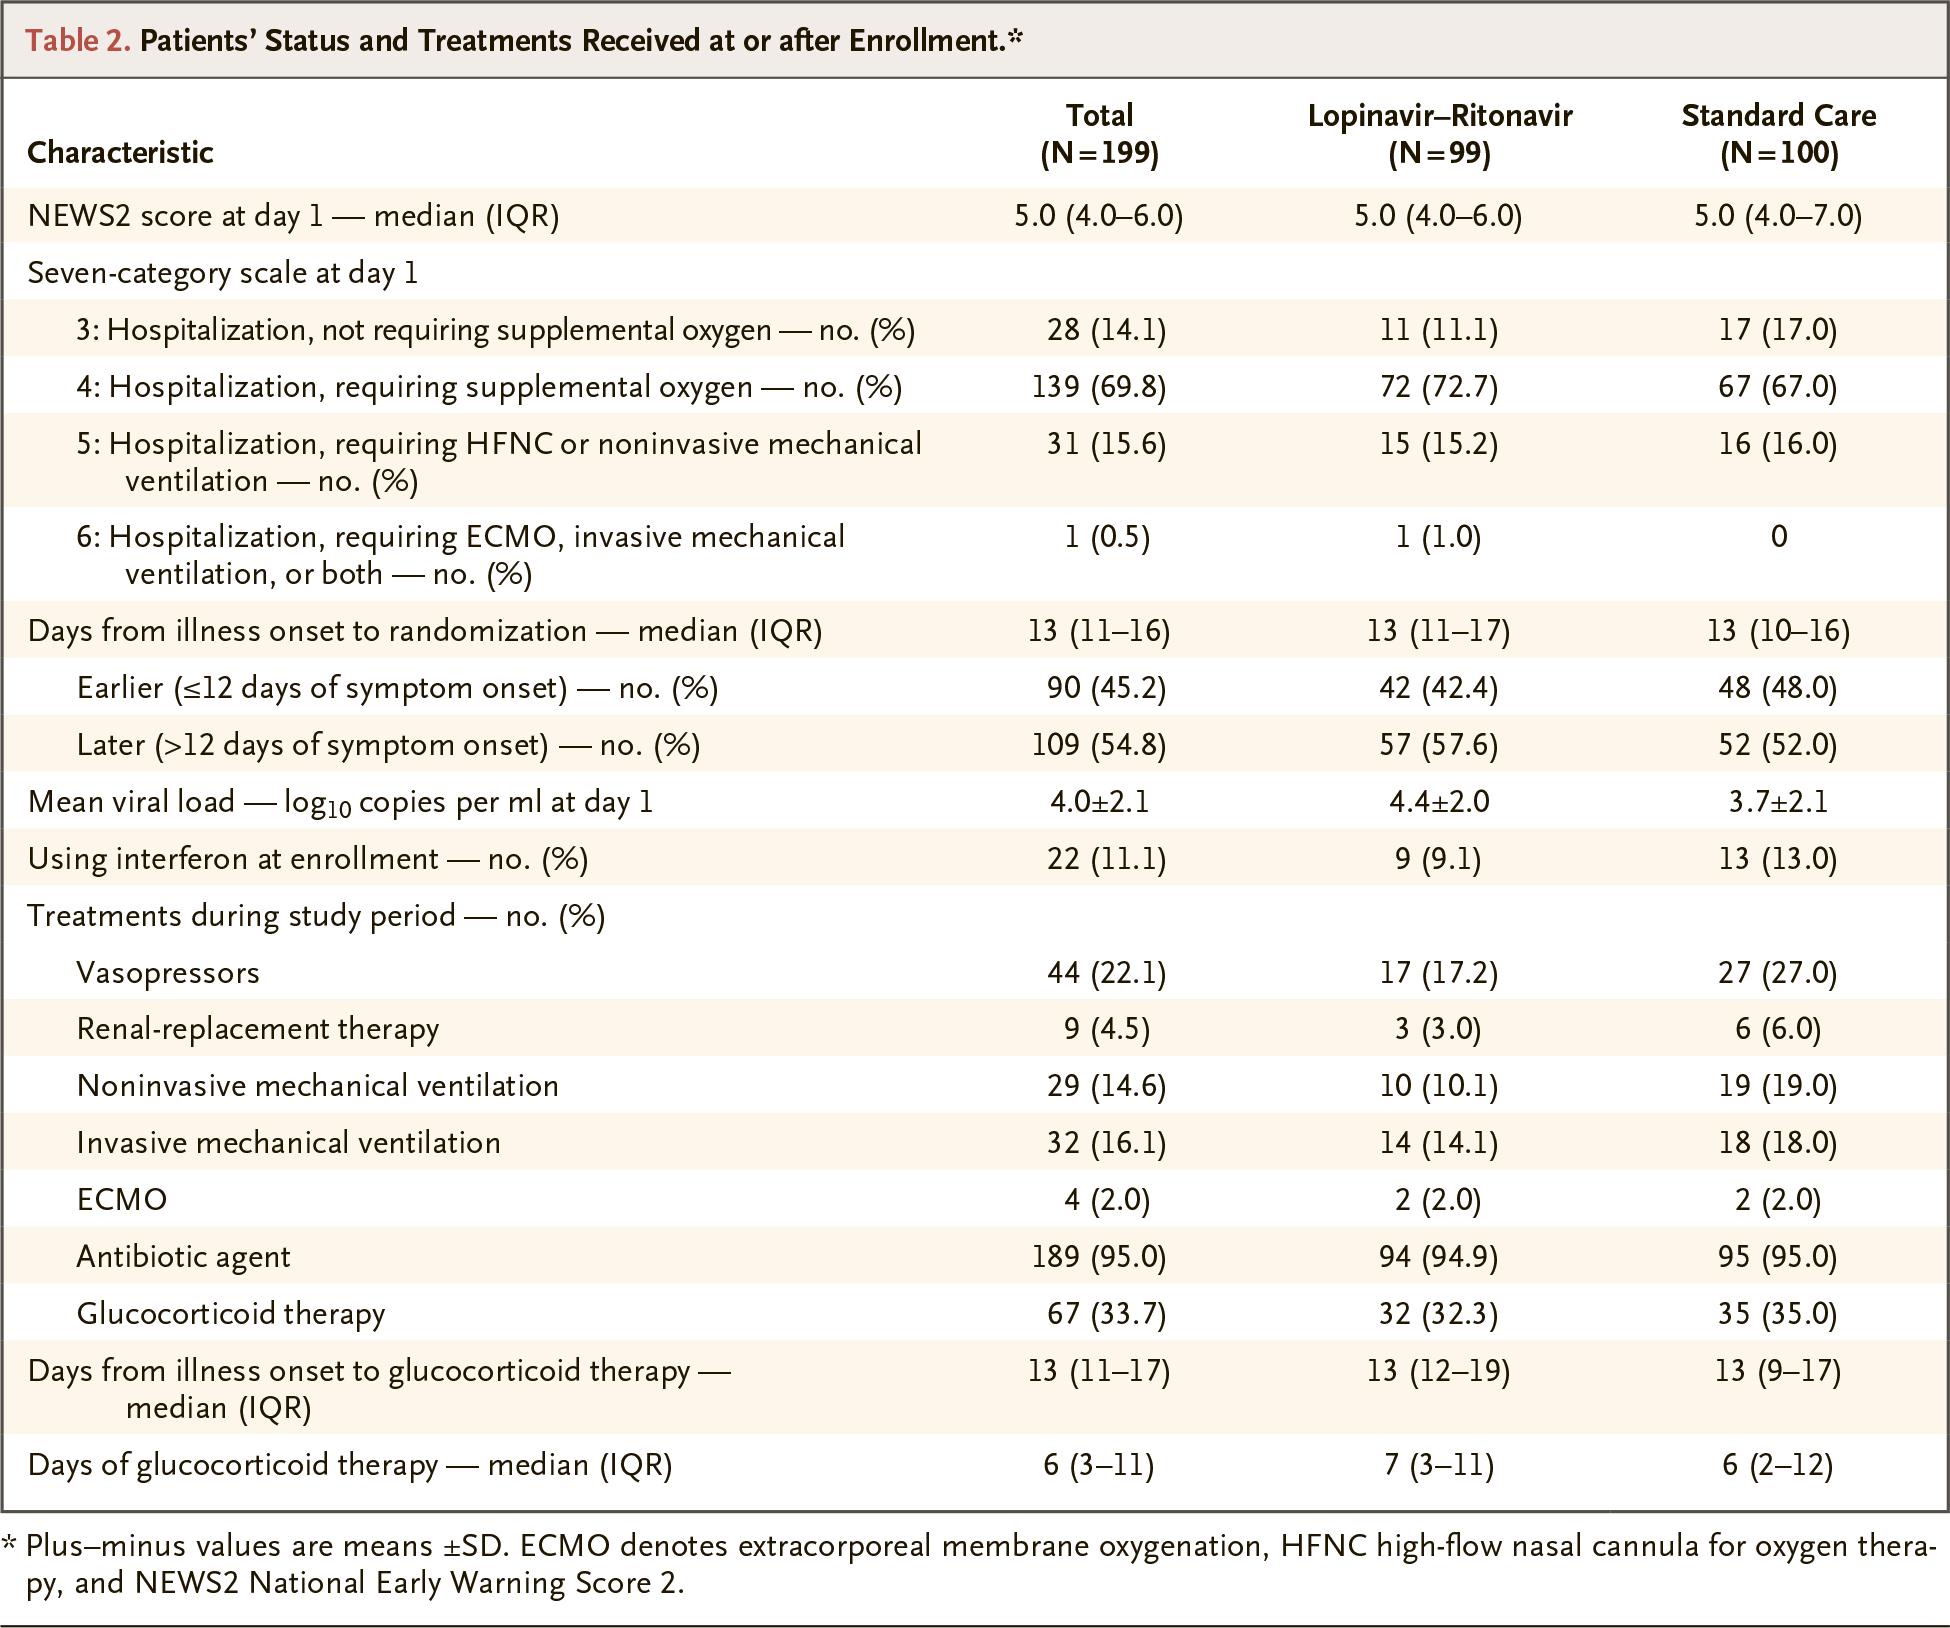 chictr2000029308 results 02 - Коронавирус. Лекарства. Лопинавир и ритонавир не помогли в лечении COVID-19